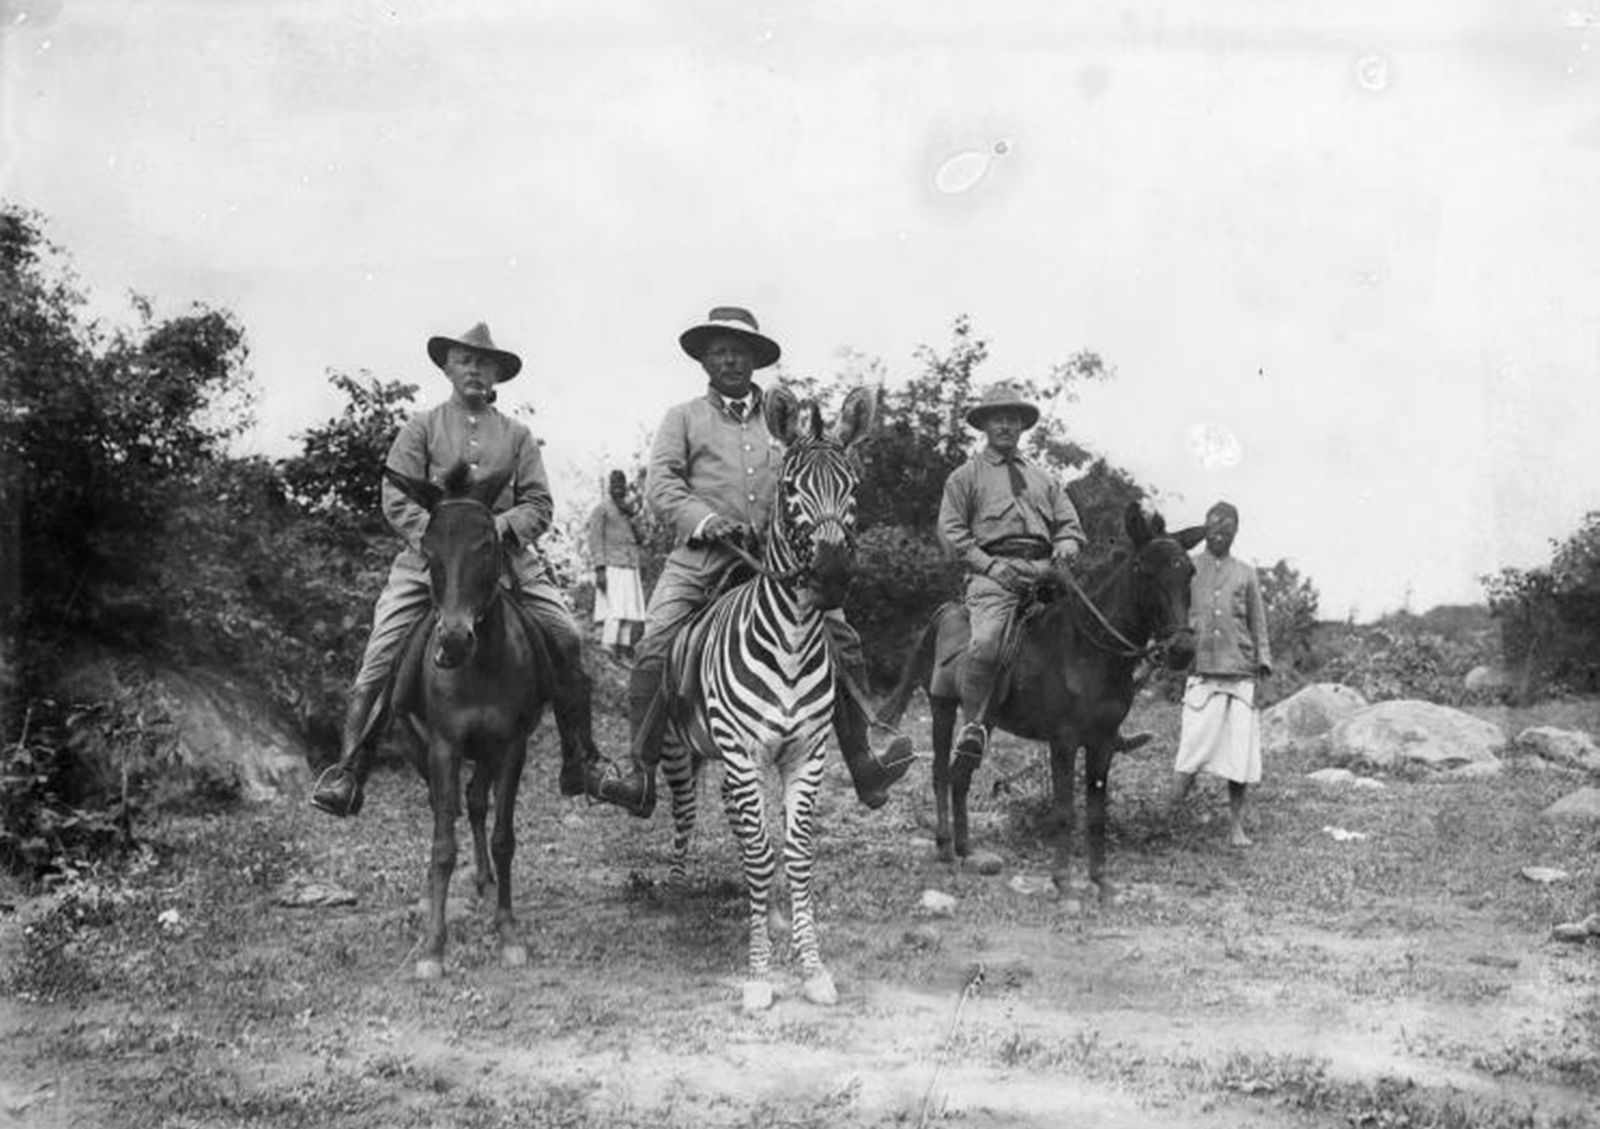 Zebra und Maulesel